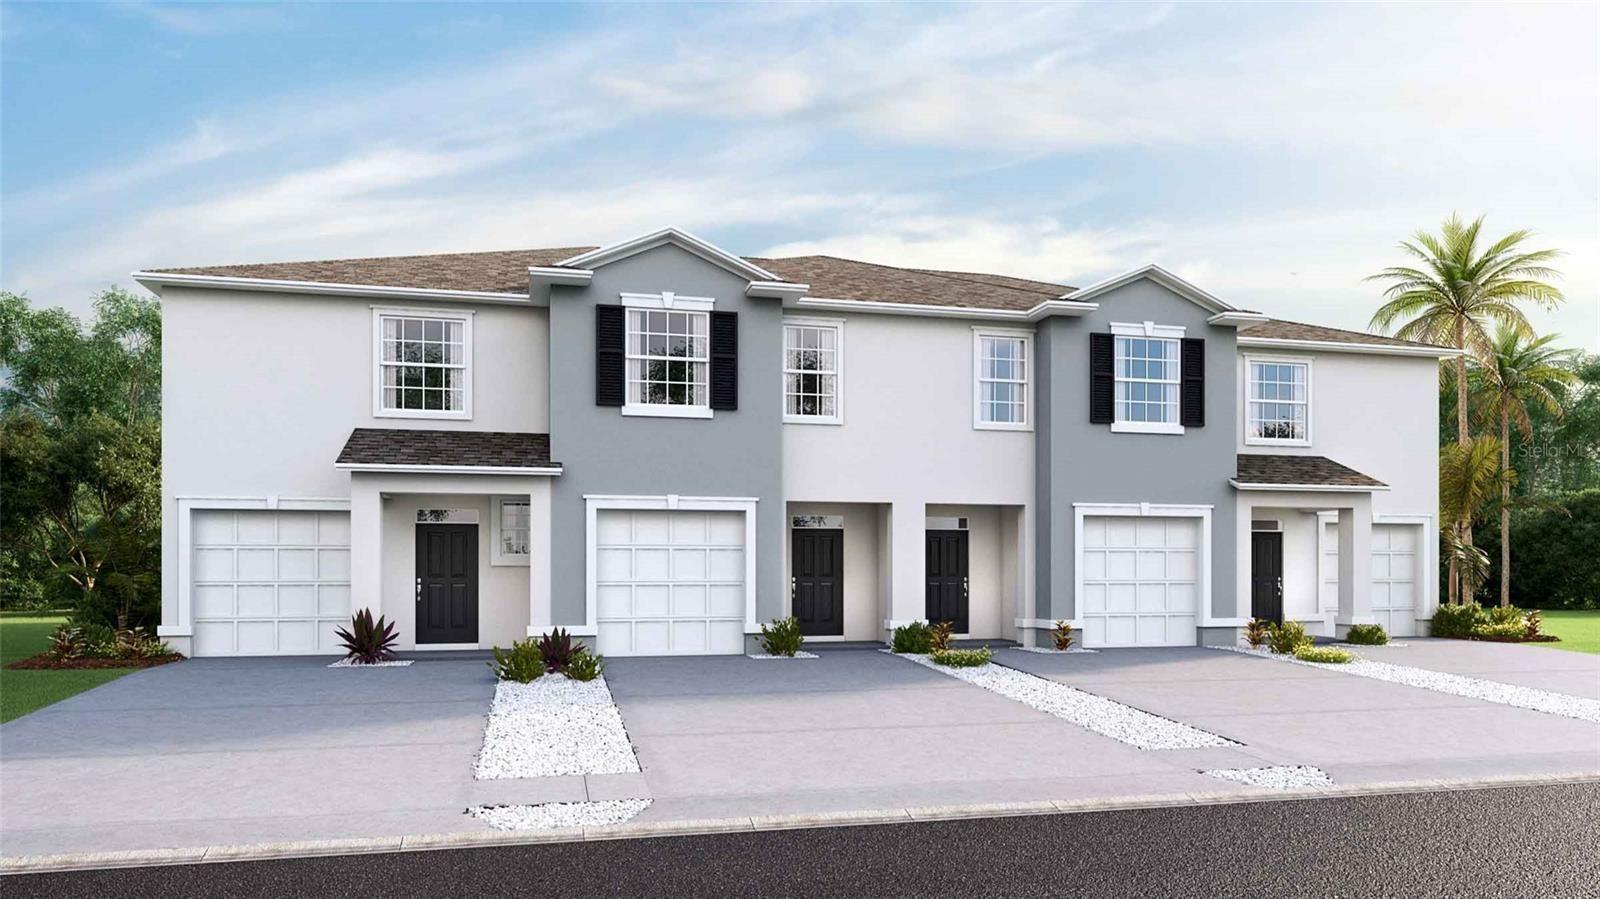 Photo of 11427 PLANETREE PLACE, BRADENTON, FL 34211 (MLS # T3335428)